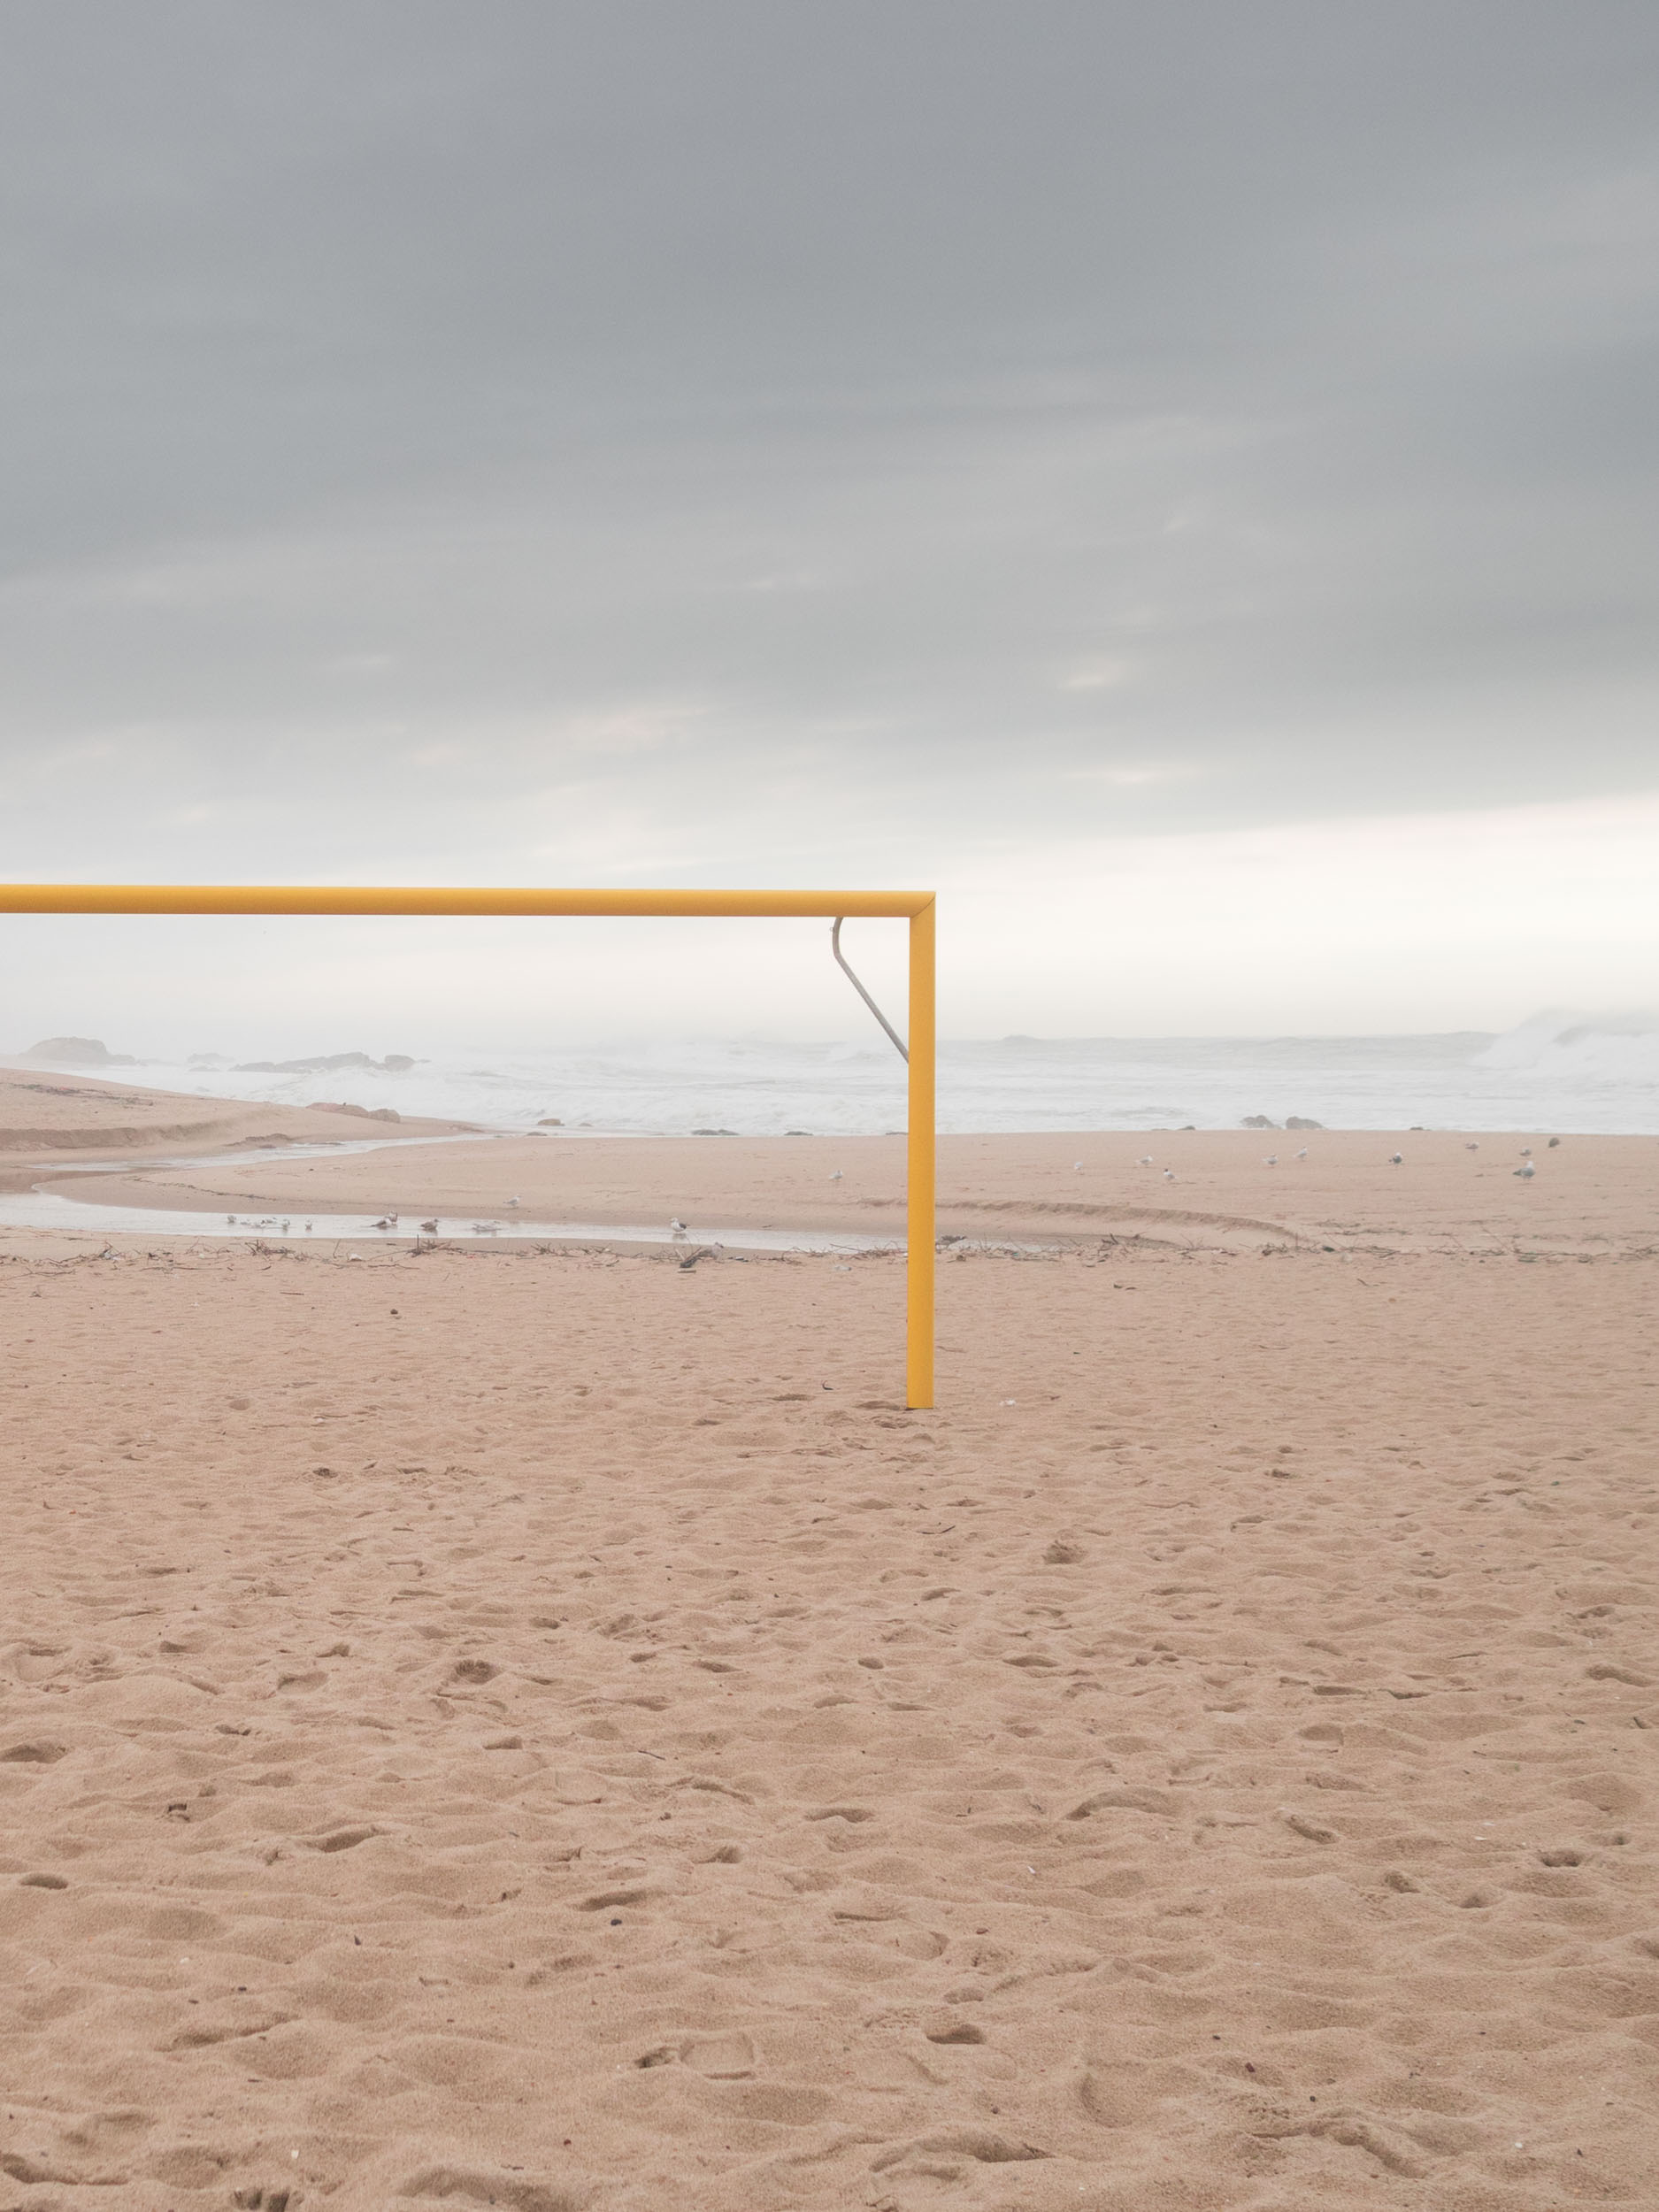 Empty football goal on a beach in Portugal.